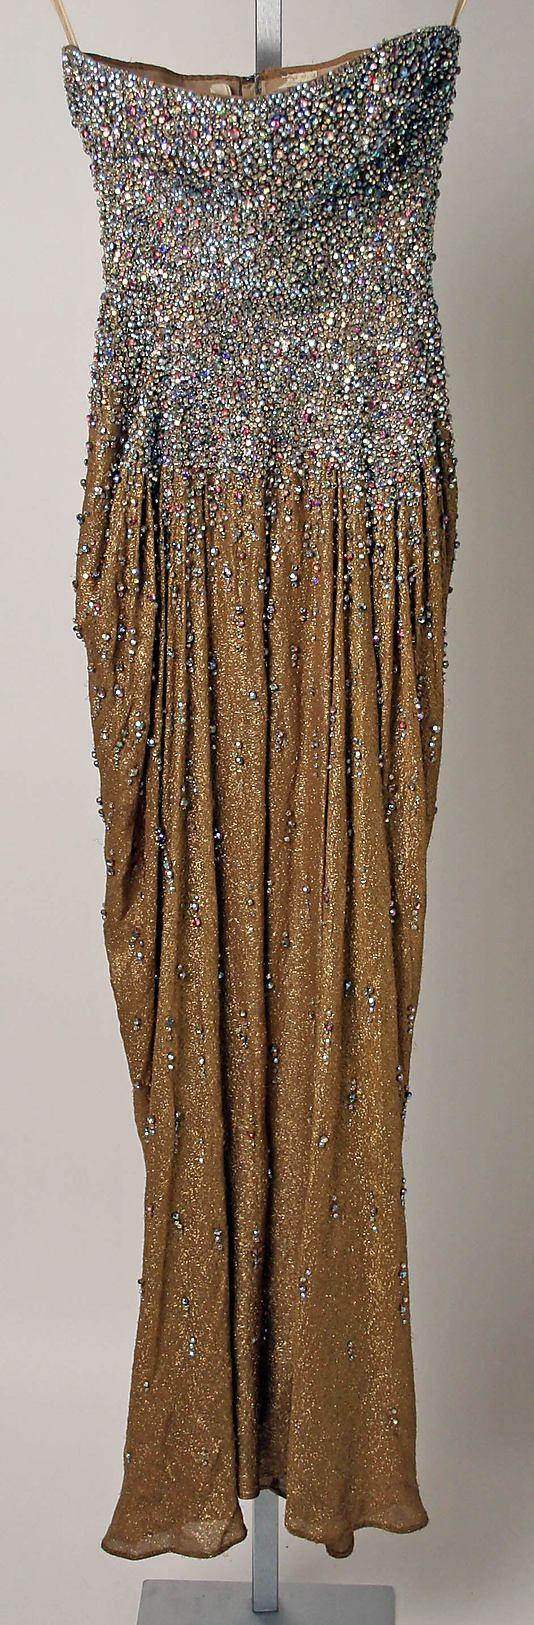 "The Metropolitan Museum of Art - ""Aurora Borealis"" by James Galanos 1959 AMERICAN"